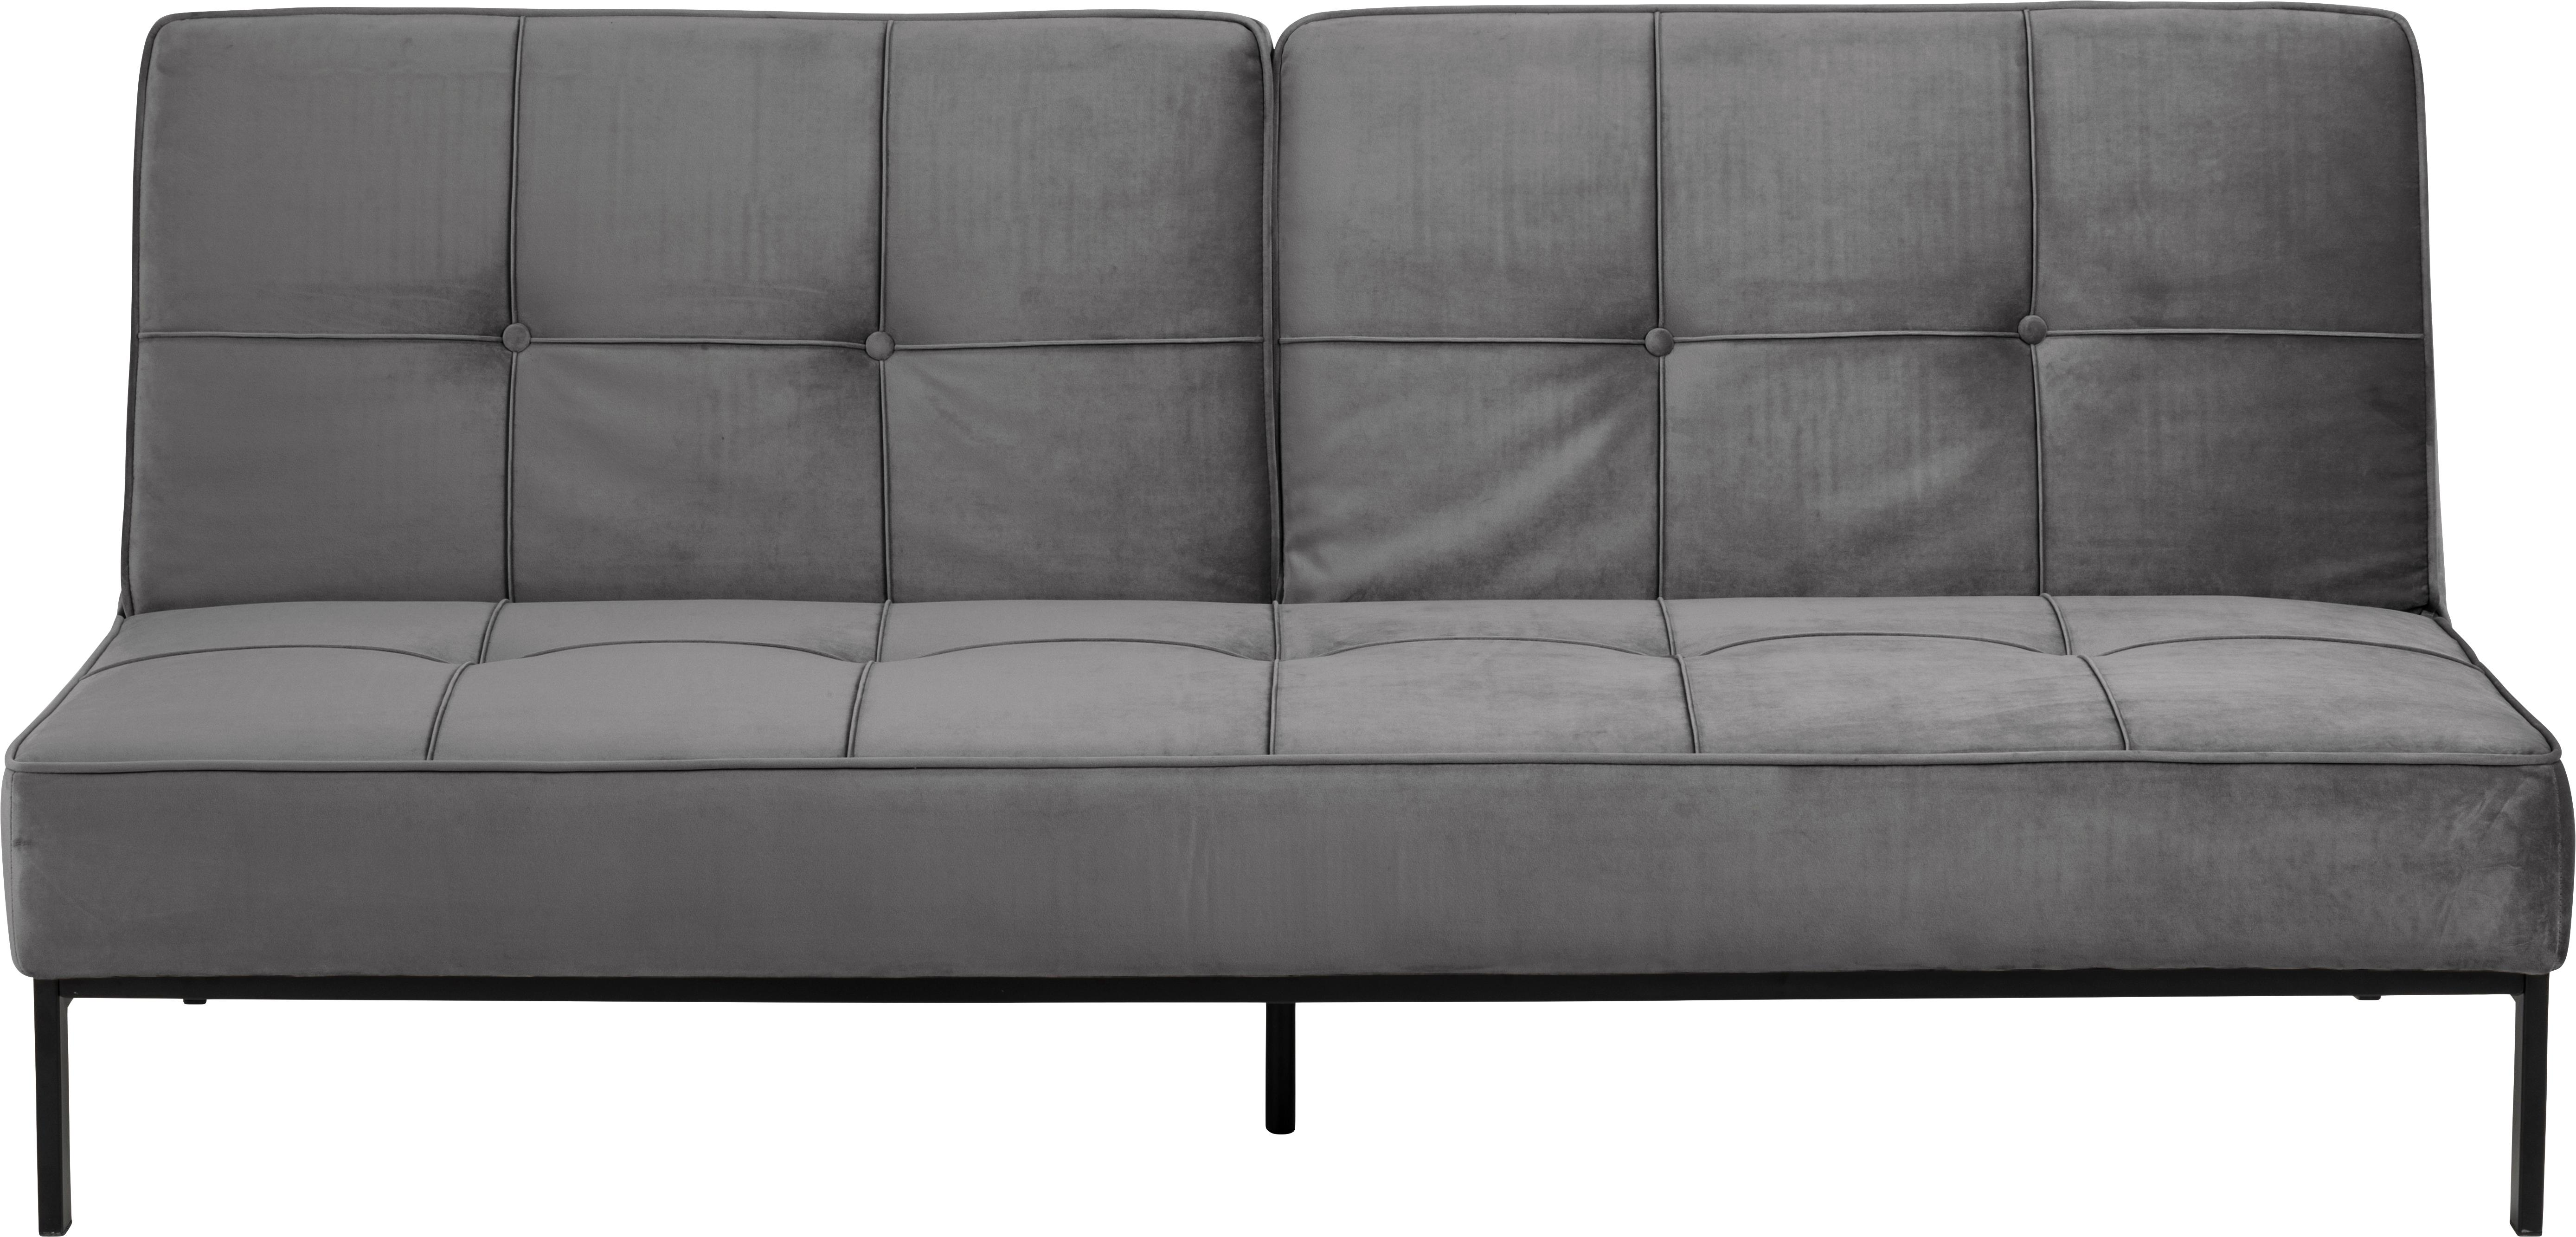 Fluwelen slaapbank Perugia, Bekleding: polyester fluweel, Poten: gelakt metaal, Fluweel donkergrijs, B 198 x D 95 cm